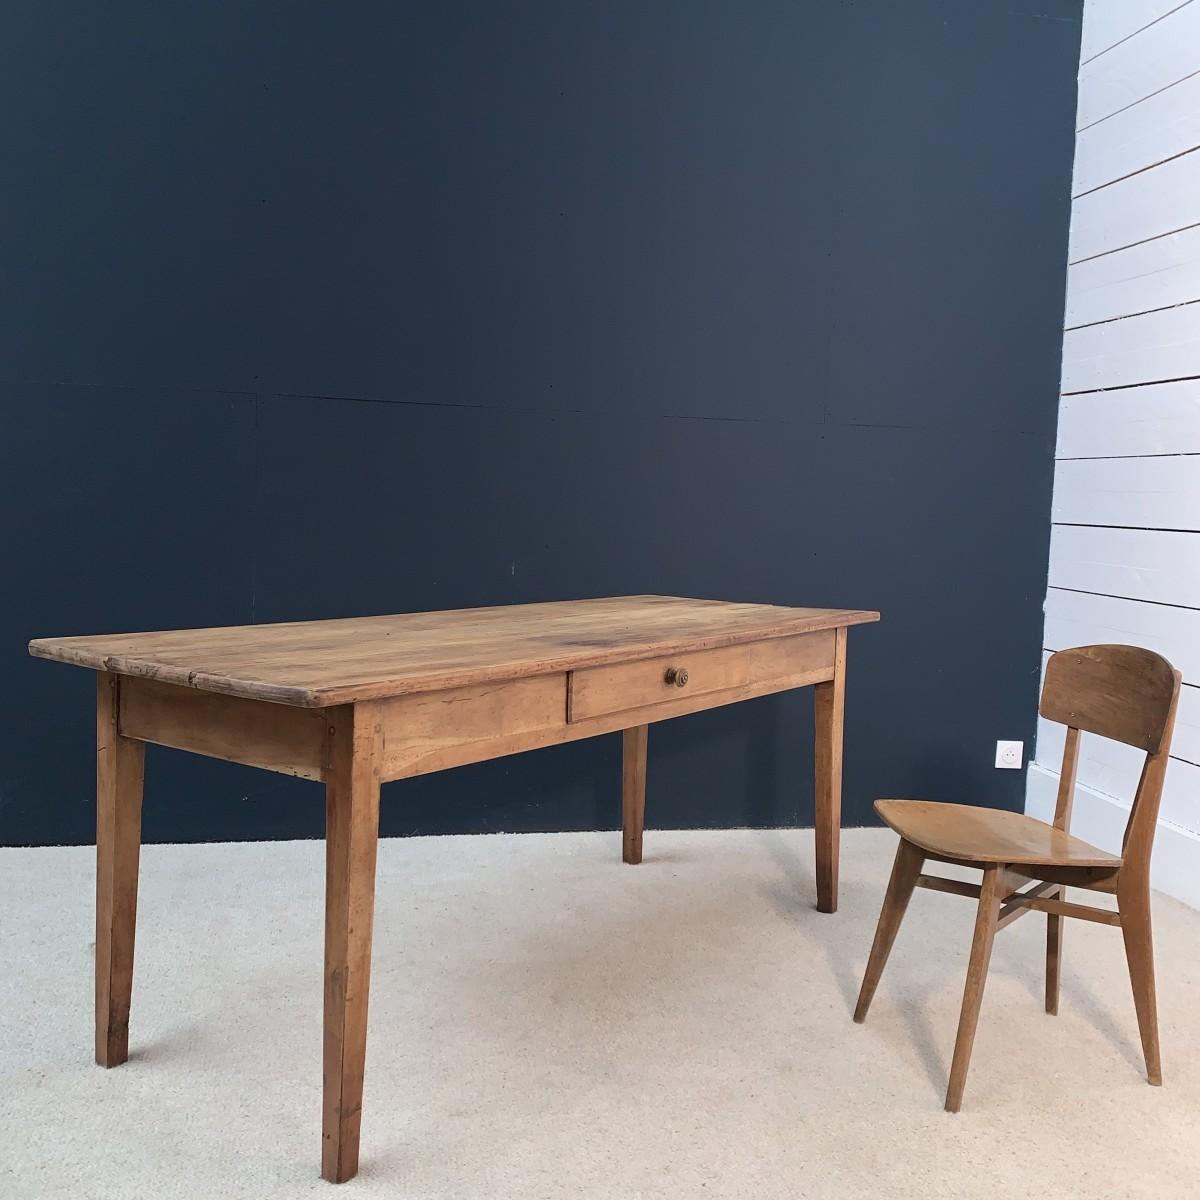 Ancienne table de ferme en bois 12